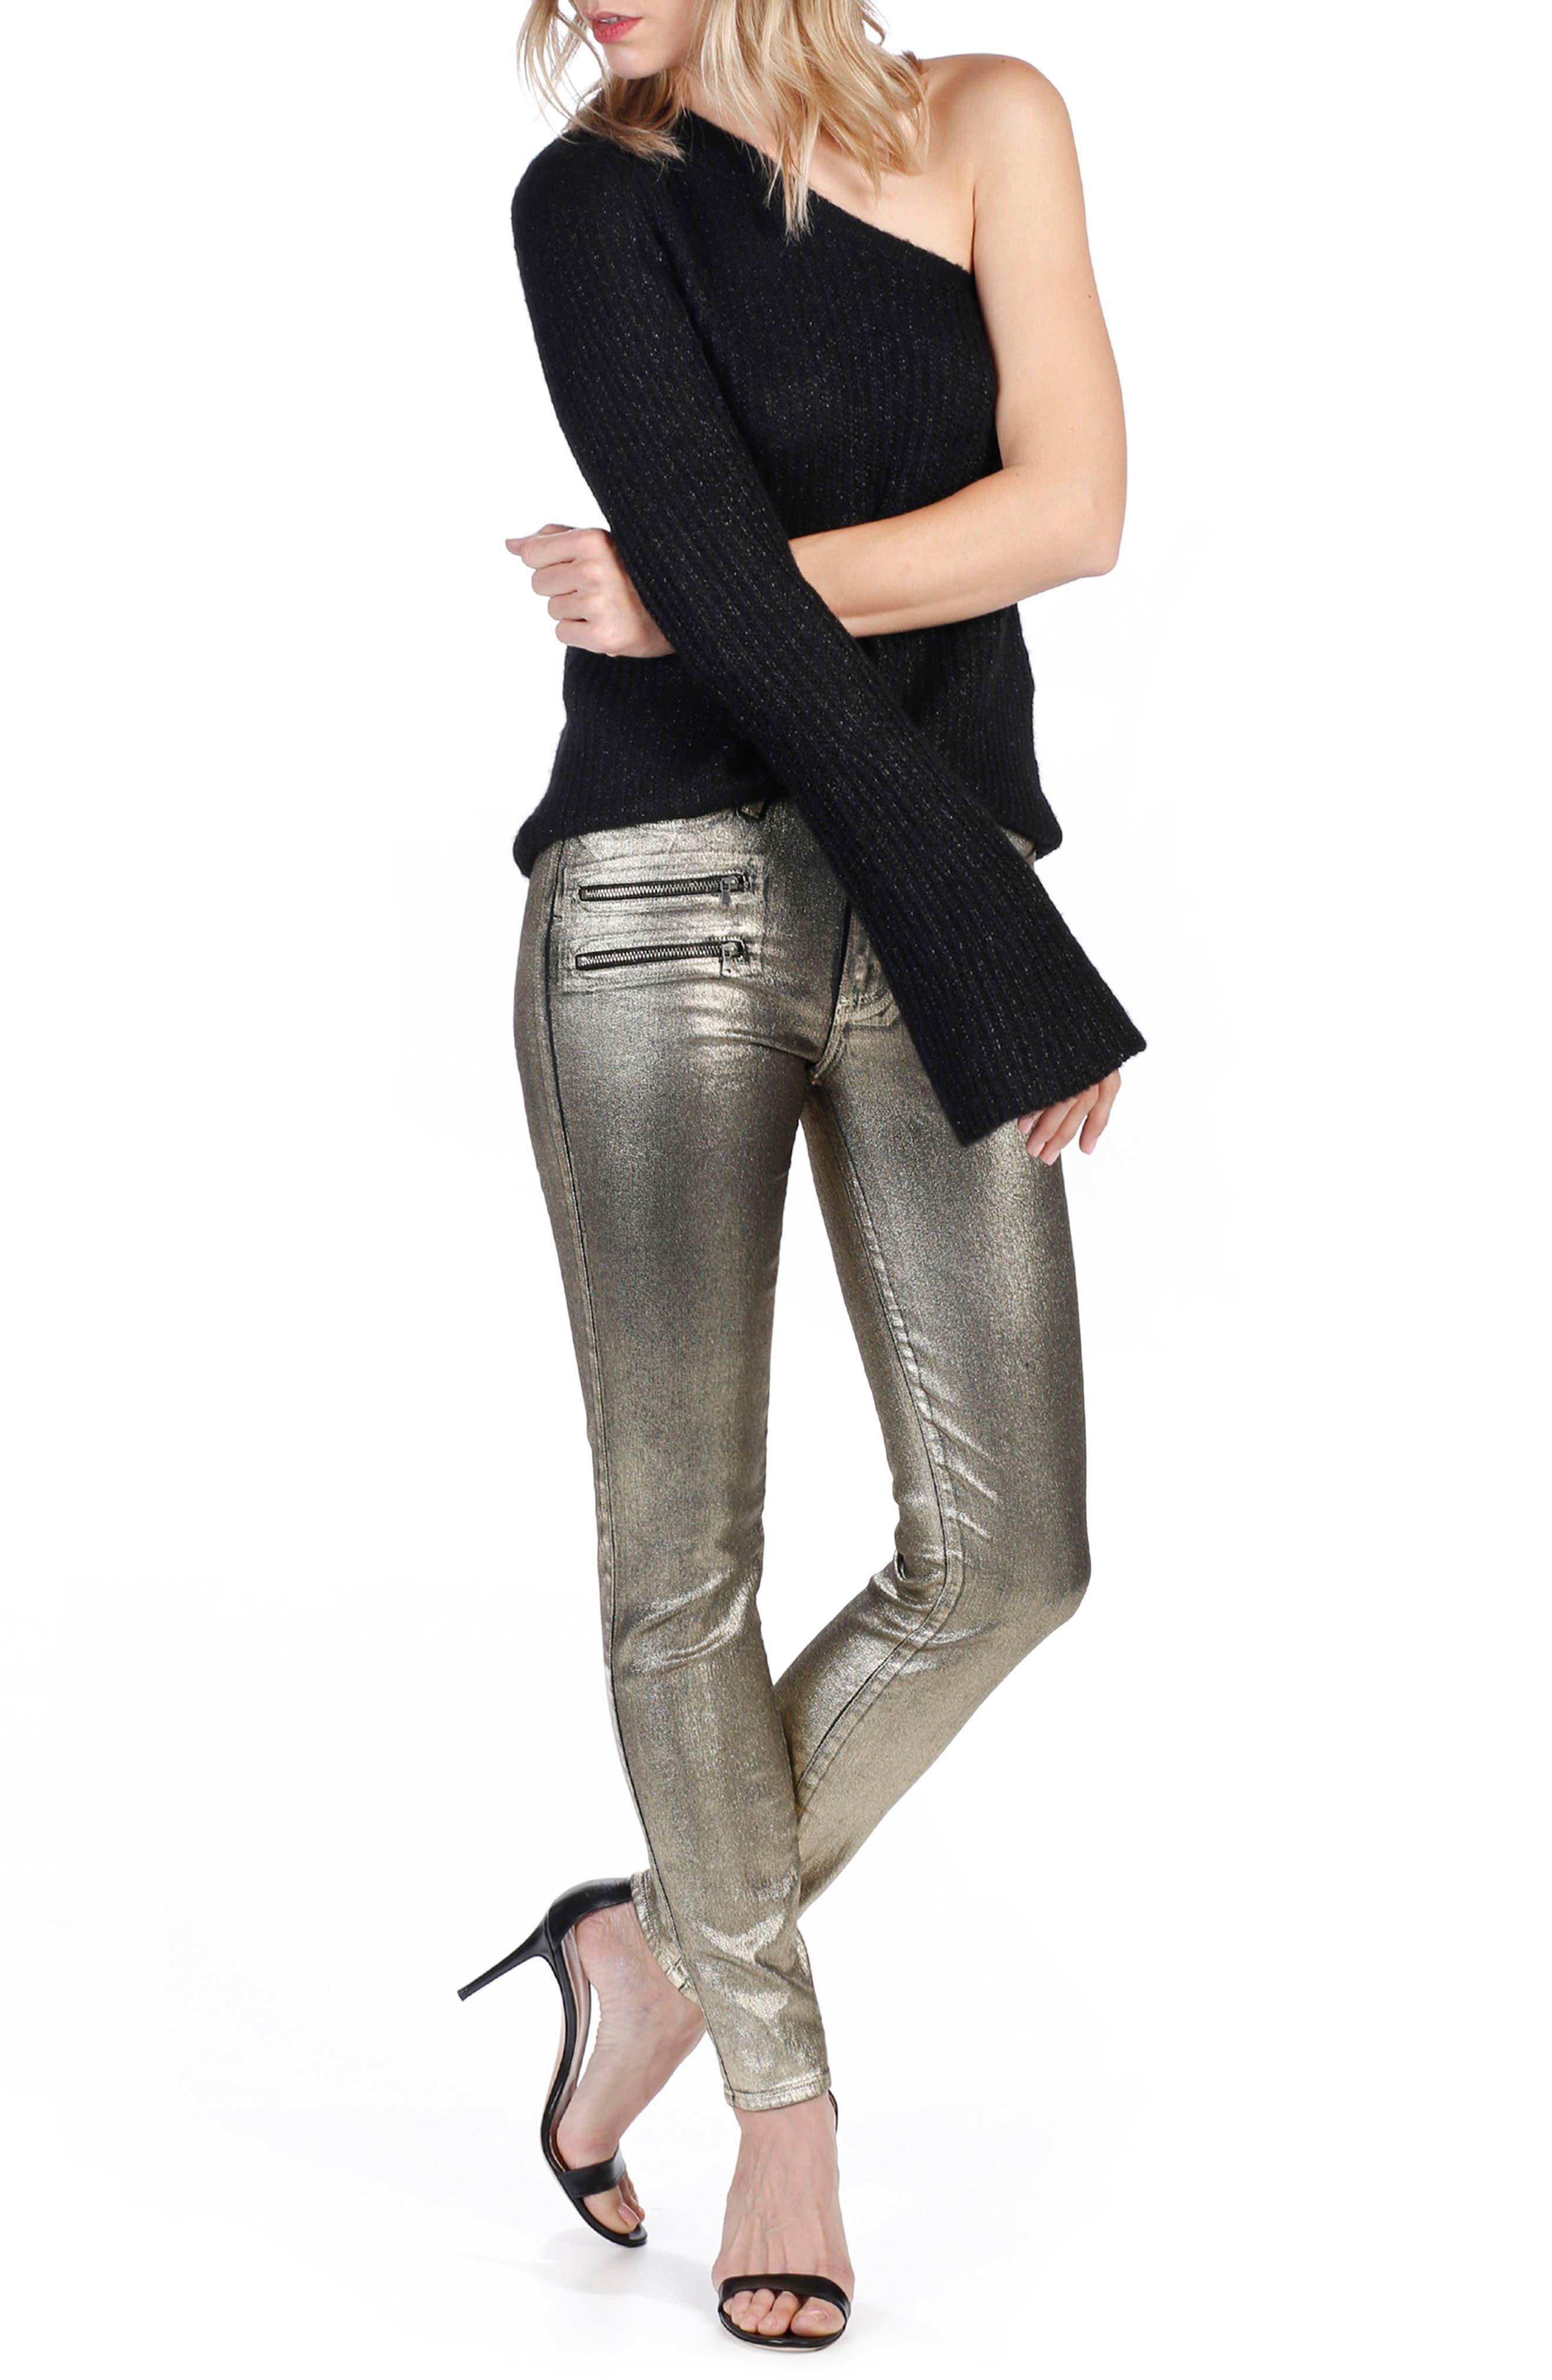 Rosie HW x PAIGE Stevie High Waist Skinny Jeans,                             Alternate thumbnail 3, color,                             710